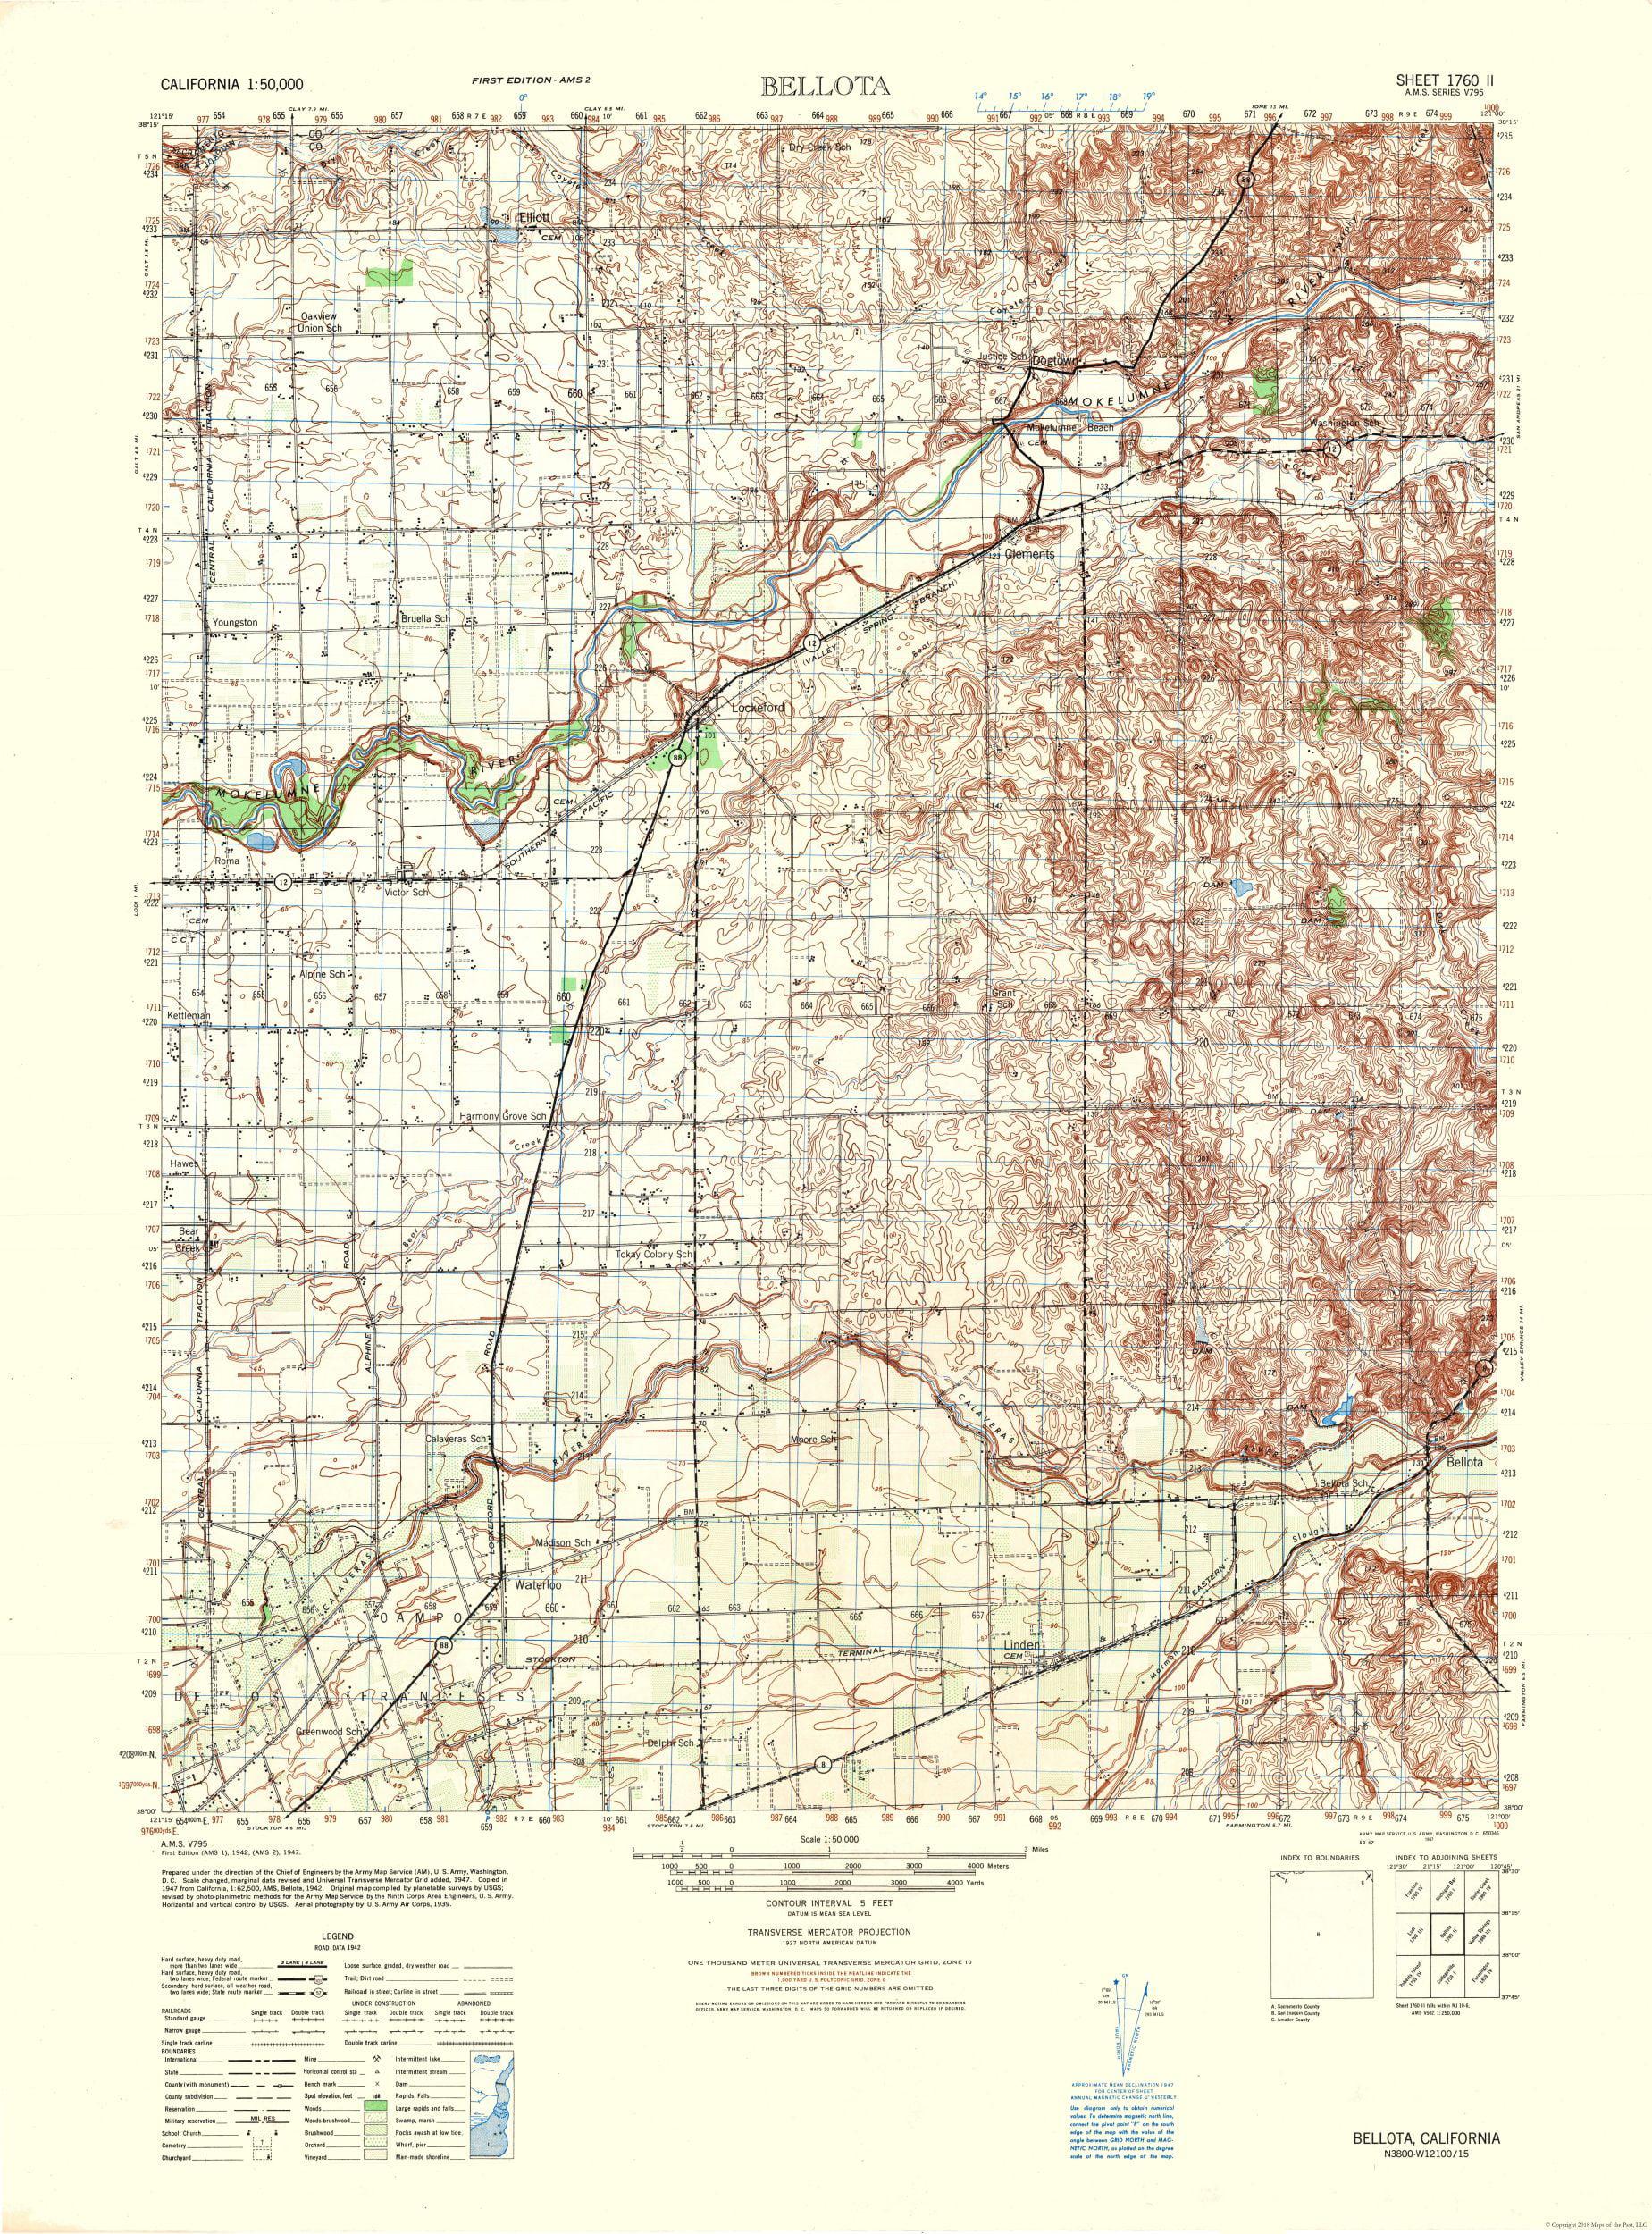 Topographic Map Bellota California Sheet Us Army 1942 23 X